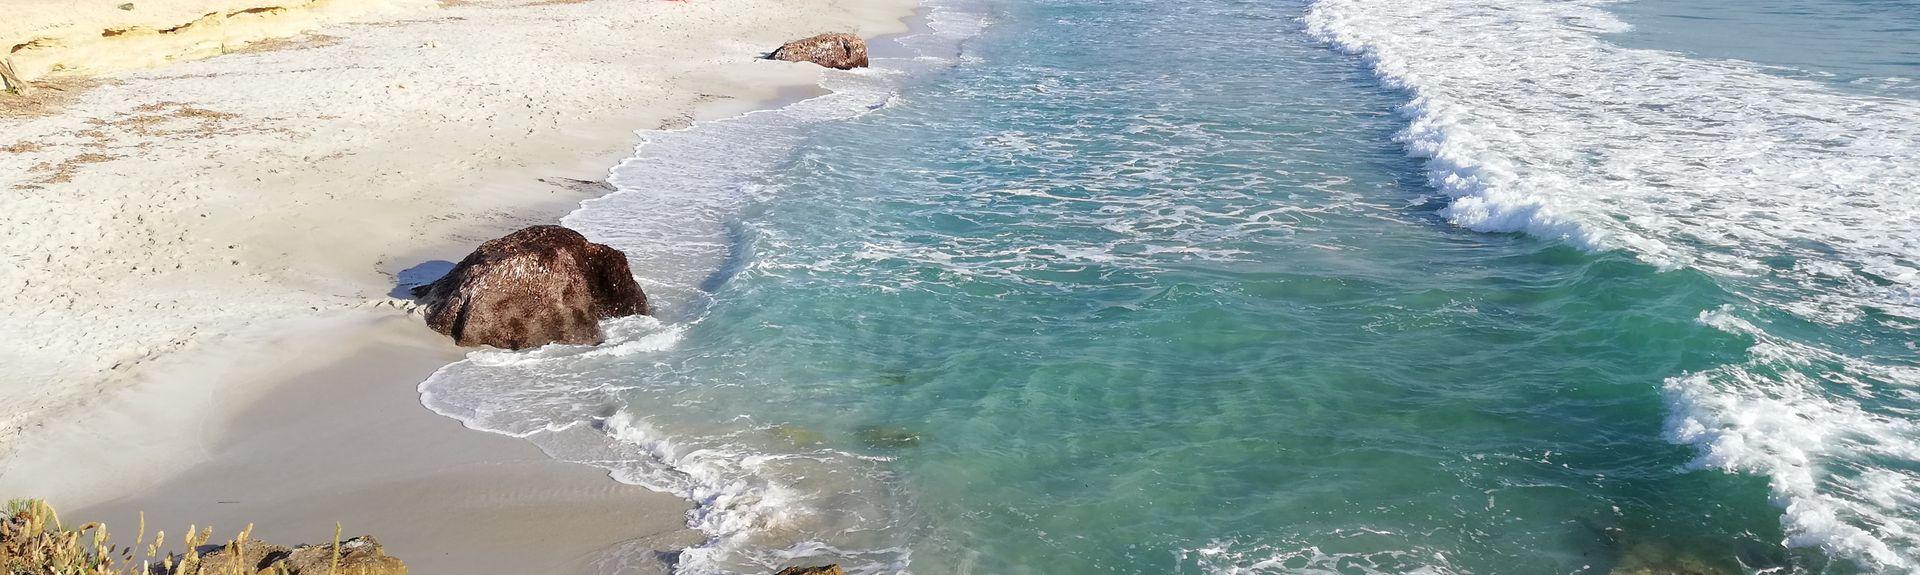 Spiaggia di Is Arutas, Cabras, Sardegna, Italia